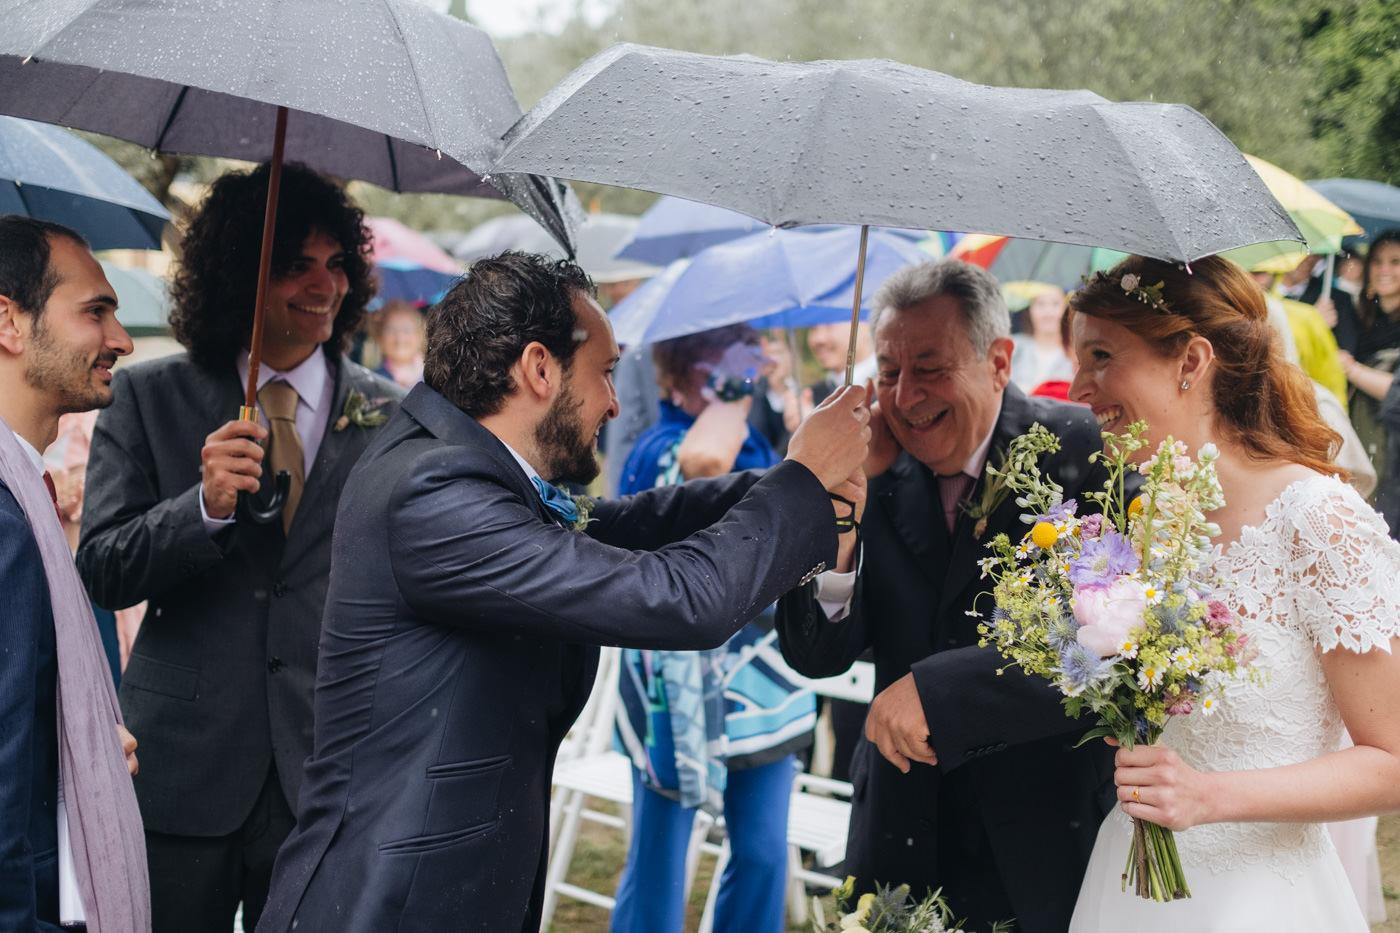 matrimoni_all_italiana_fotografo_matrimonio_toscana-26.jpg